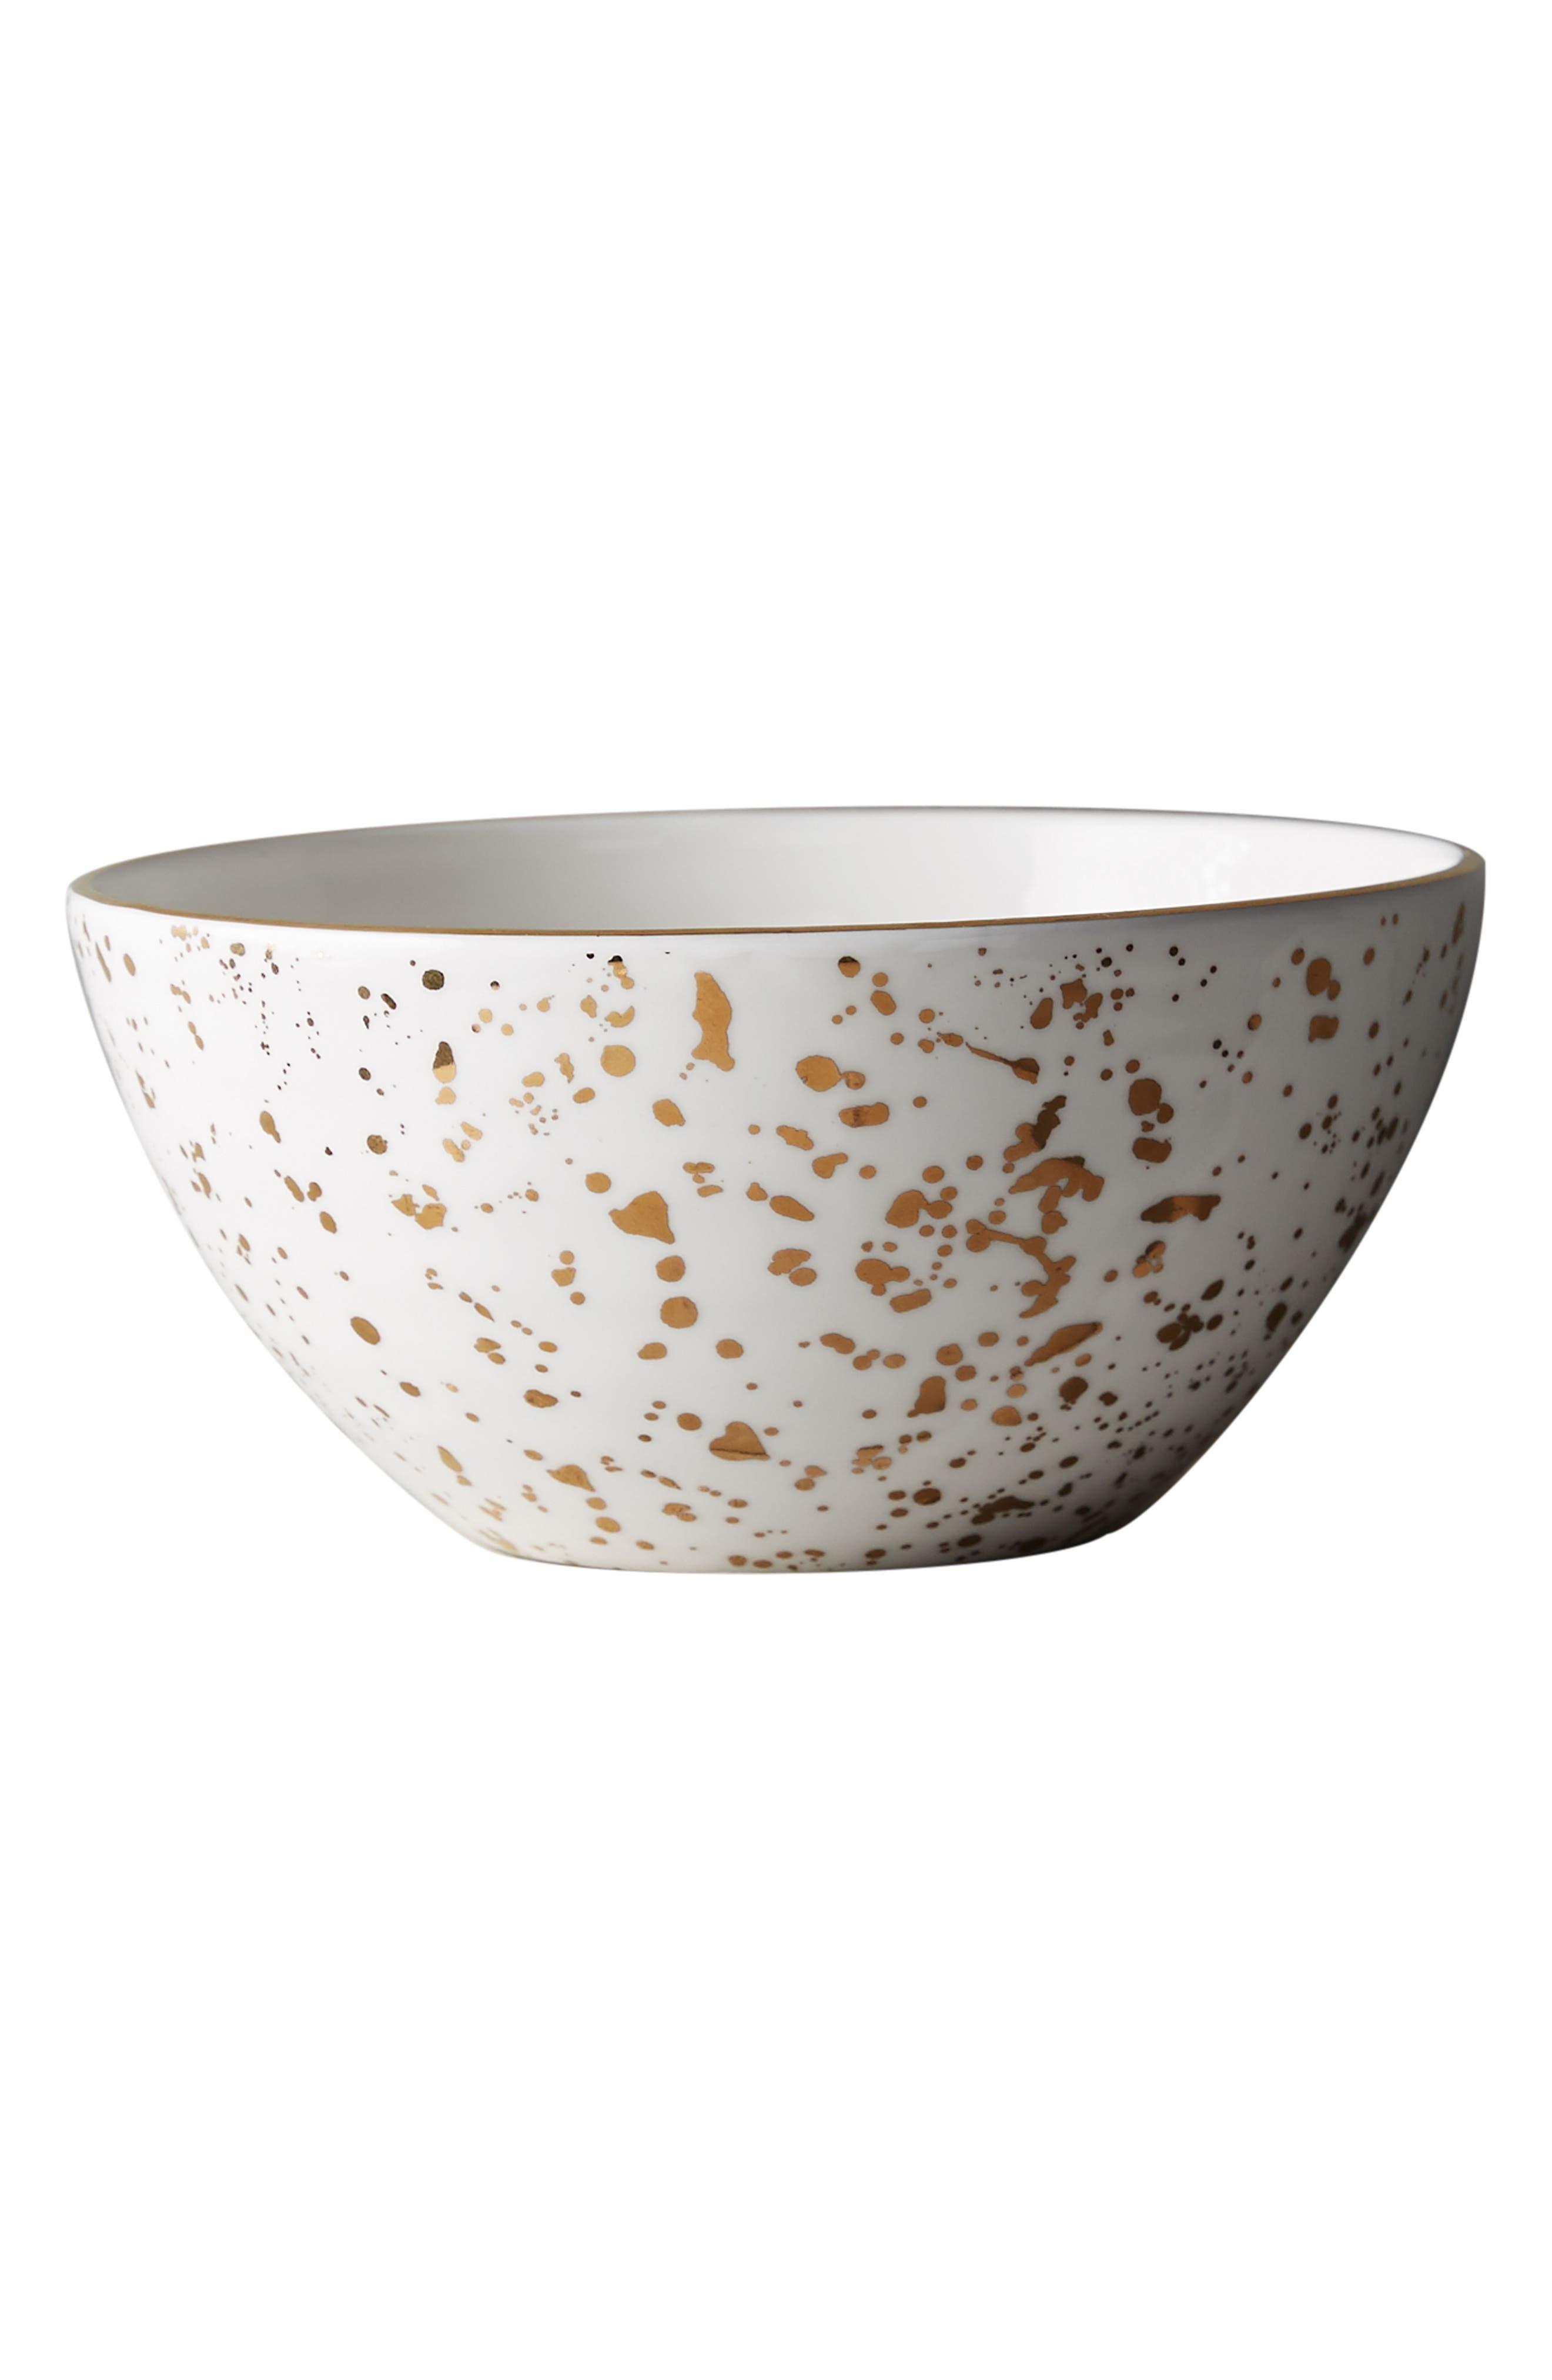 Mimira Stoneware Bowl,                             Alternate thumbnail 3, color,                             710